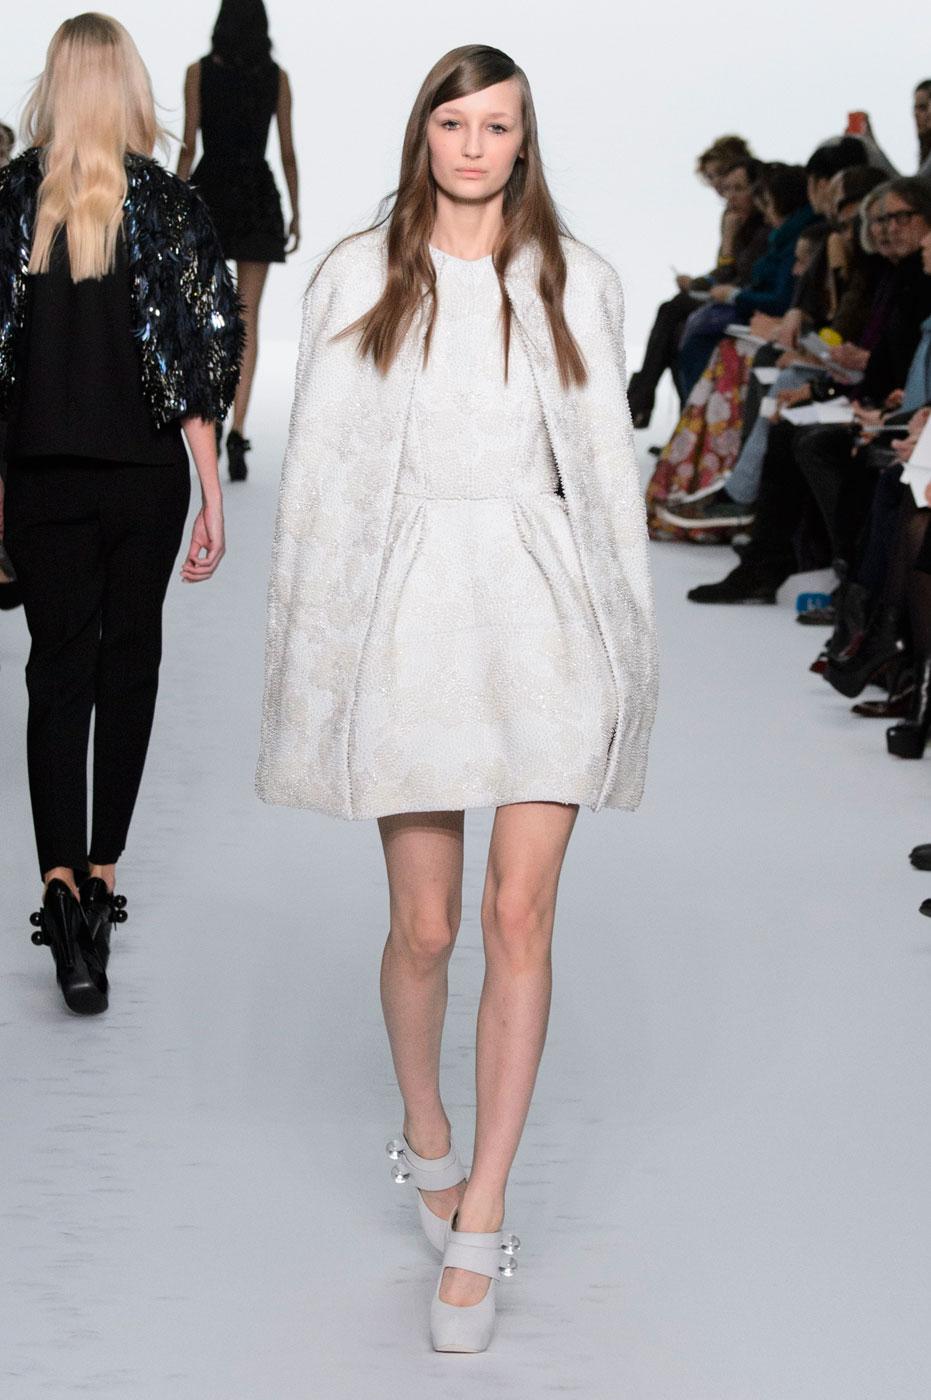 Kayek-fashion-runway-show-haute-couture-paris-spring-summer-2015-the-impression-45